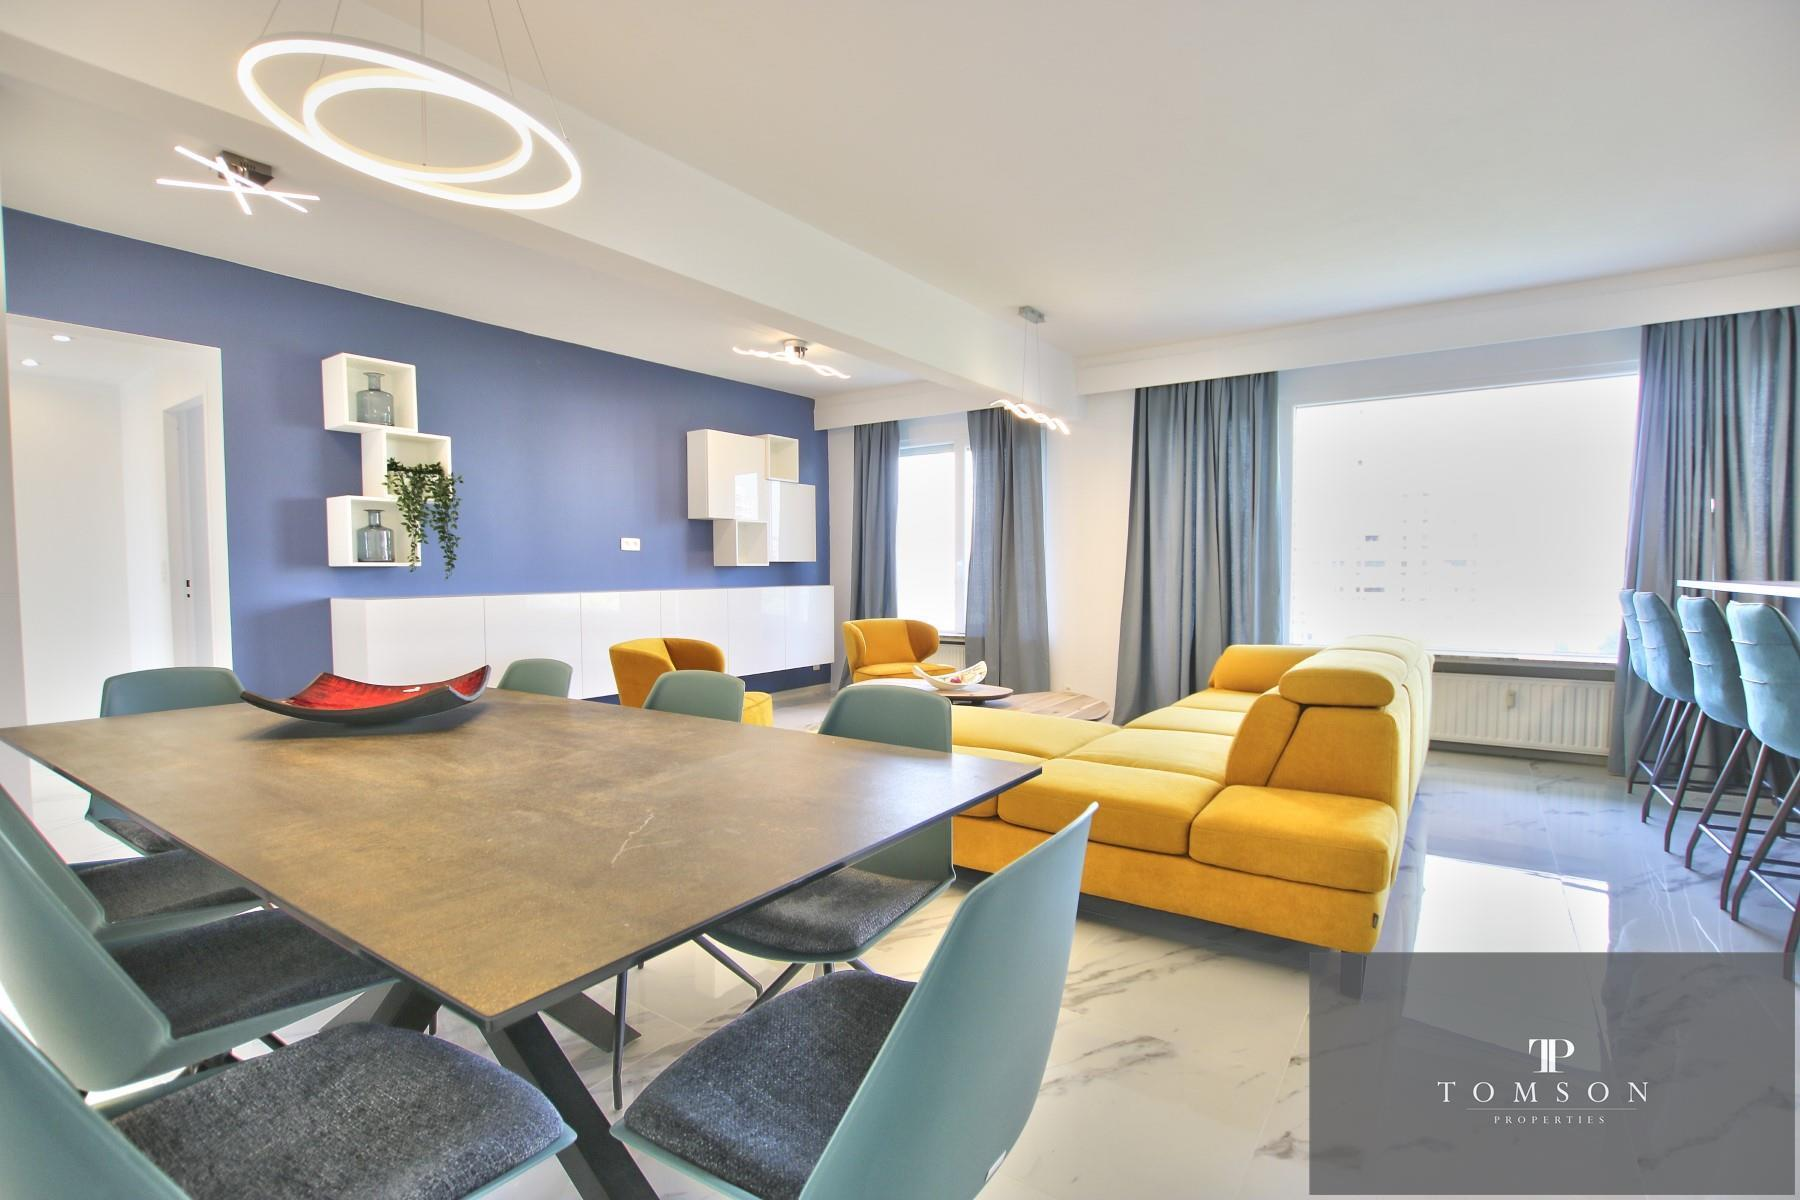 Appartement - Woluwe-Saint-Lambert - #4530510-1